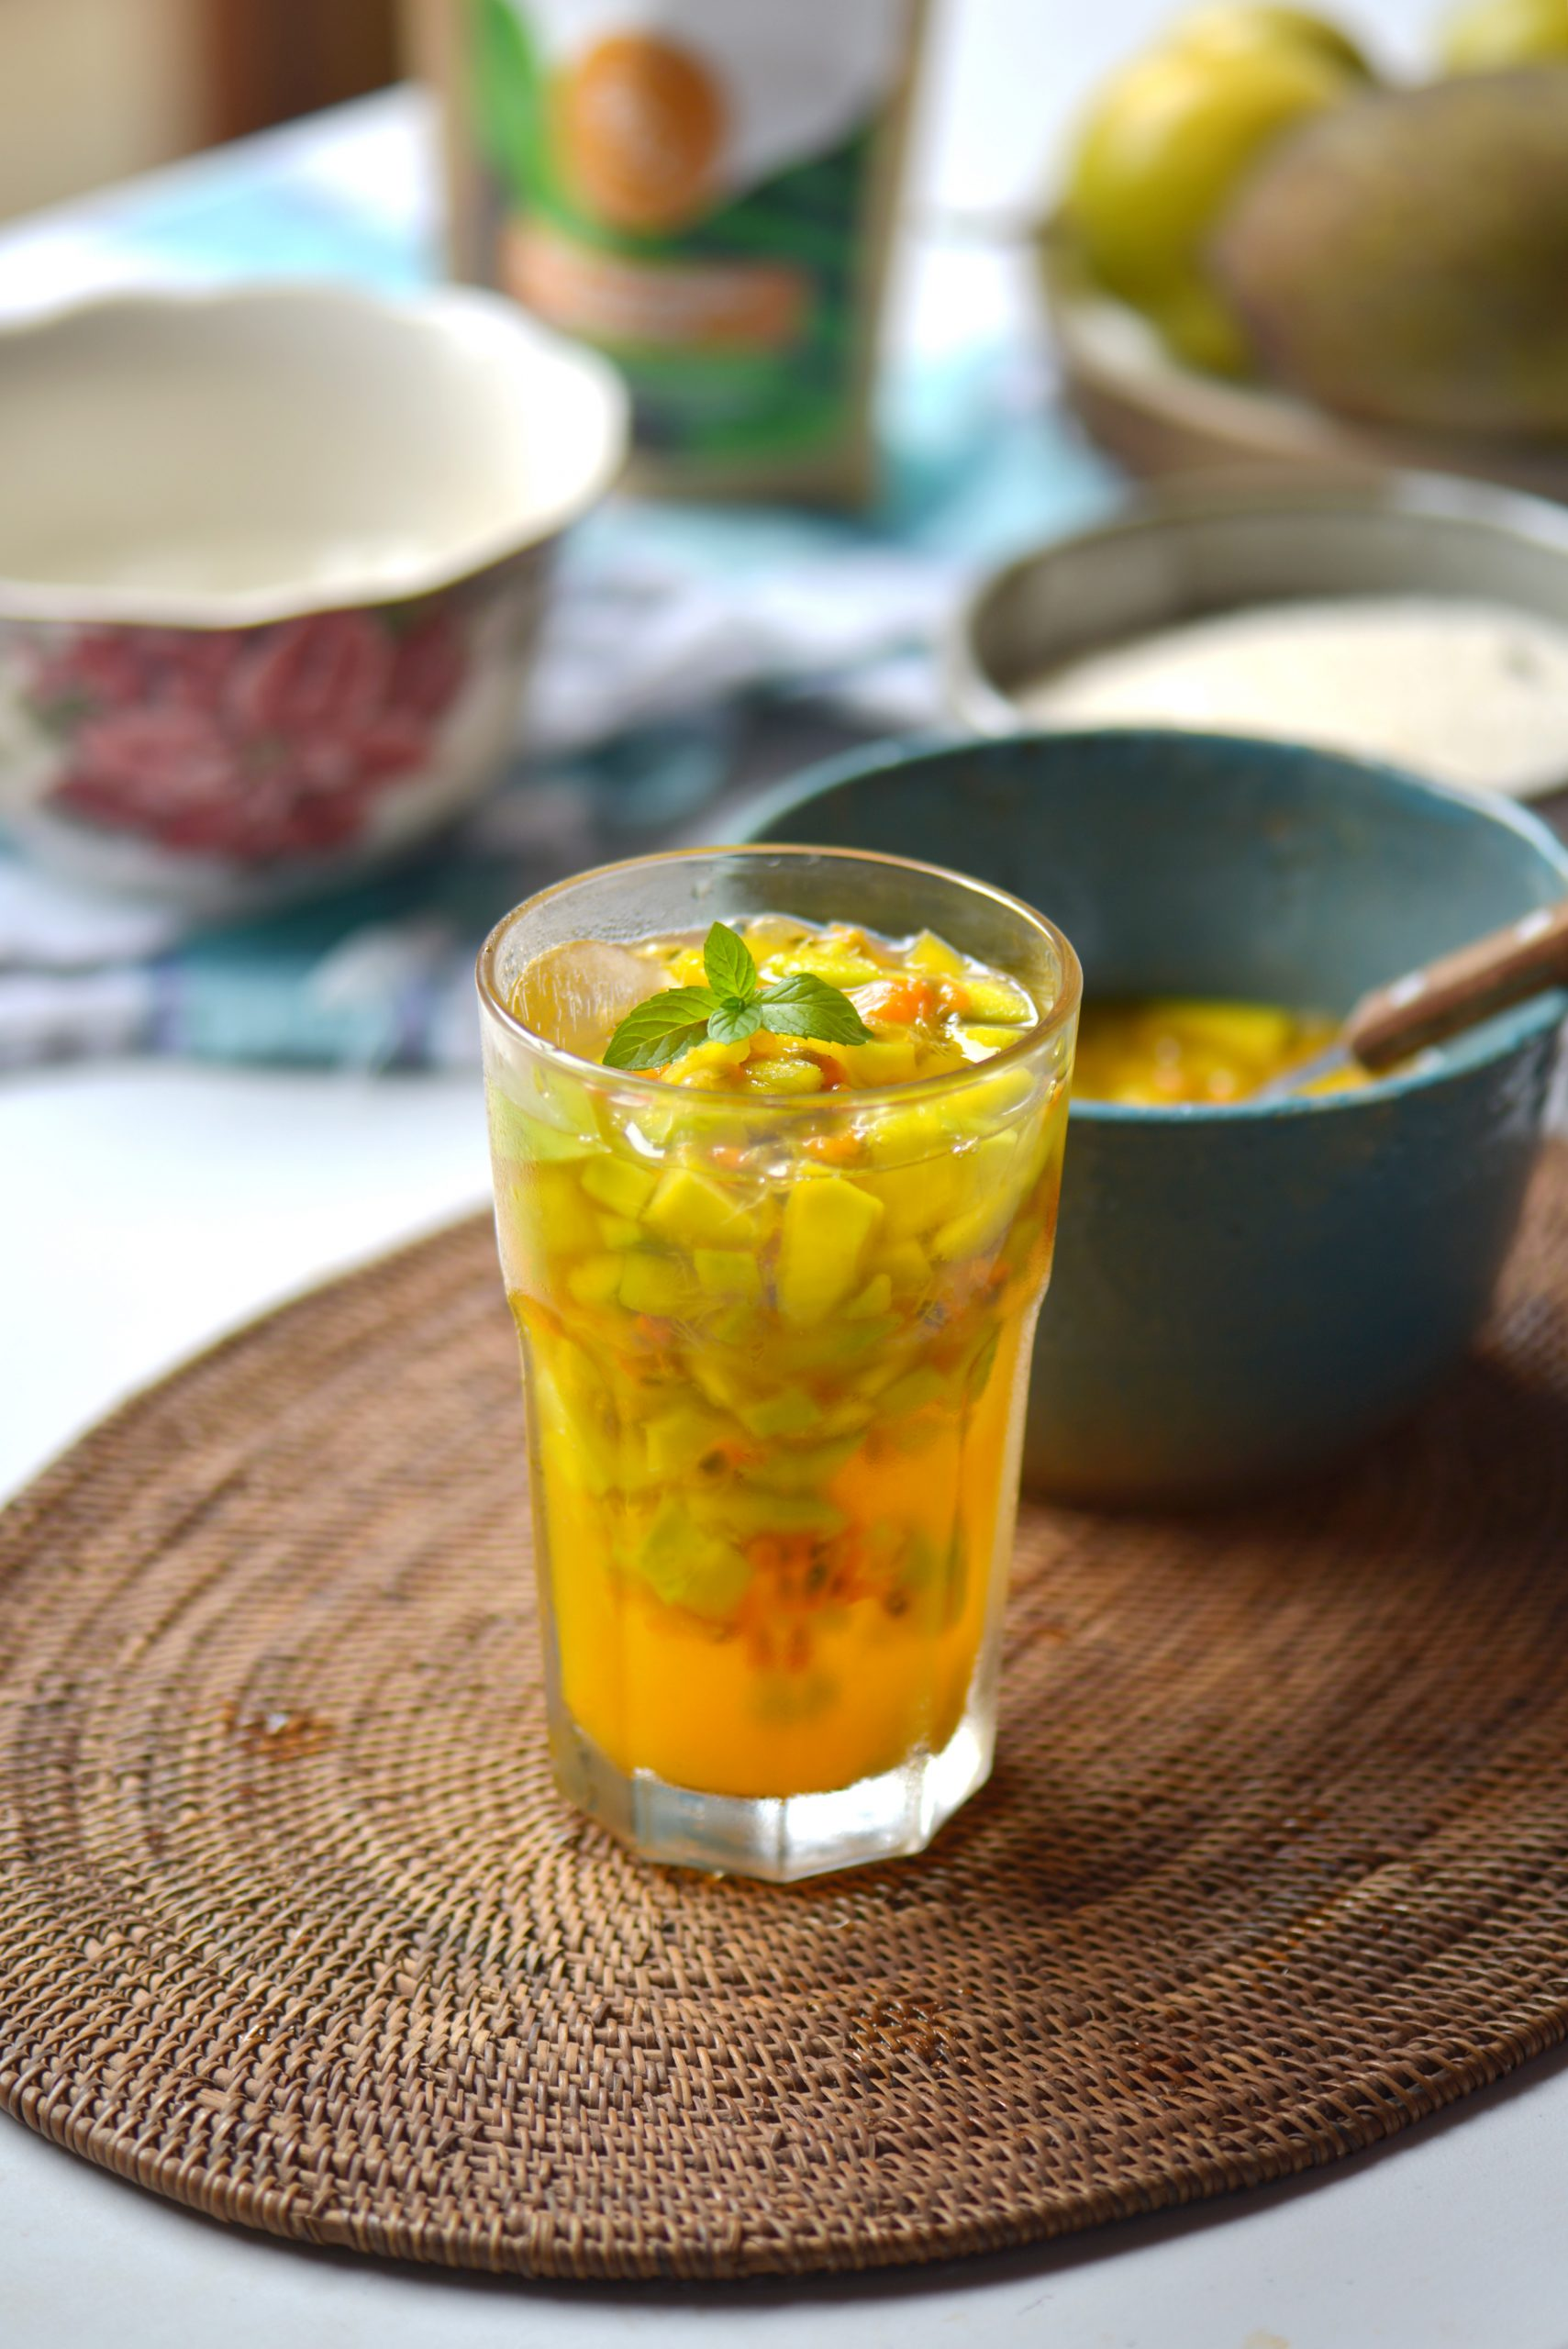 Es Markisa Kweni- Kaya Vitamin C & Penambah Nafsu Makan